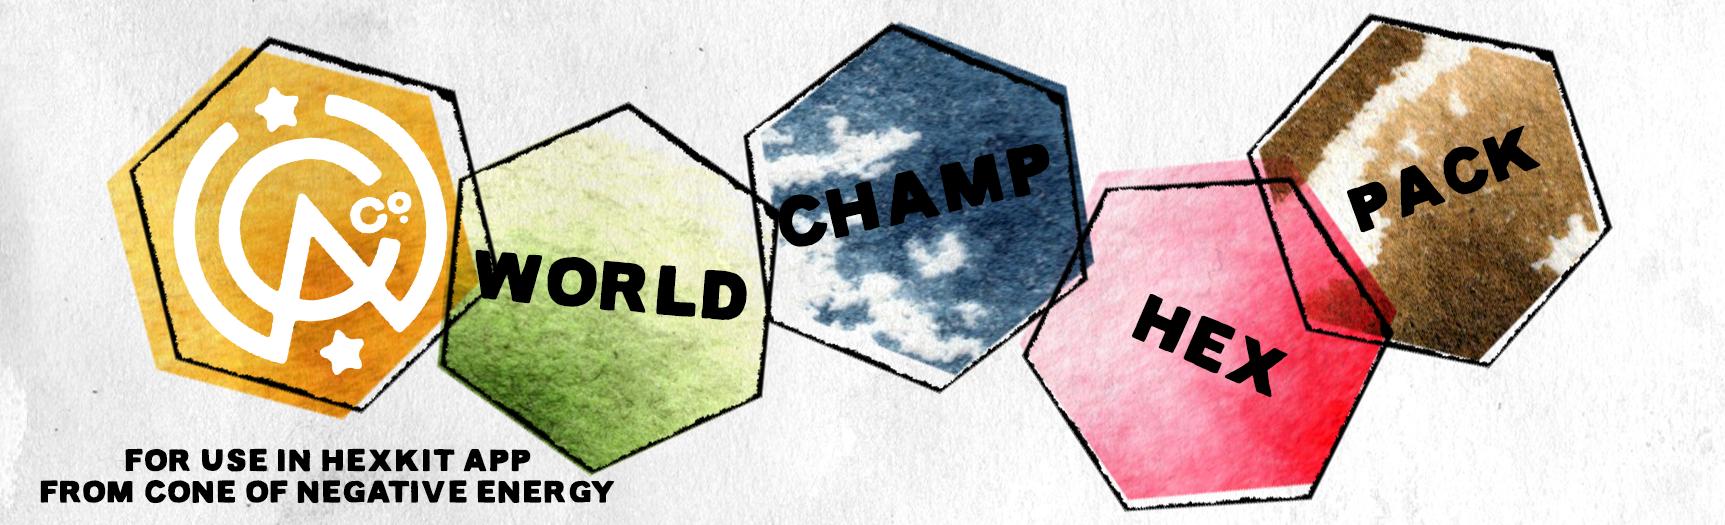 World Champ Hex Pack